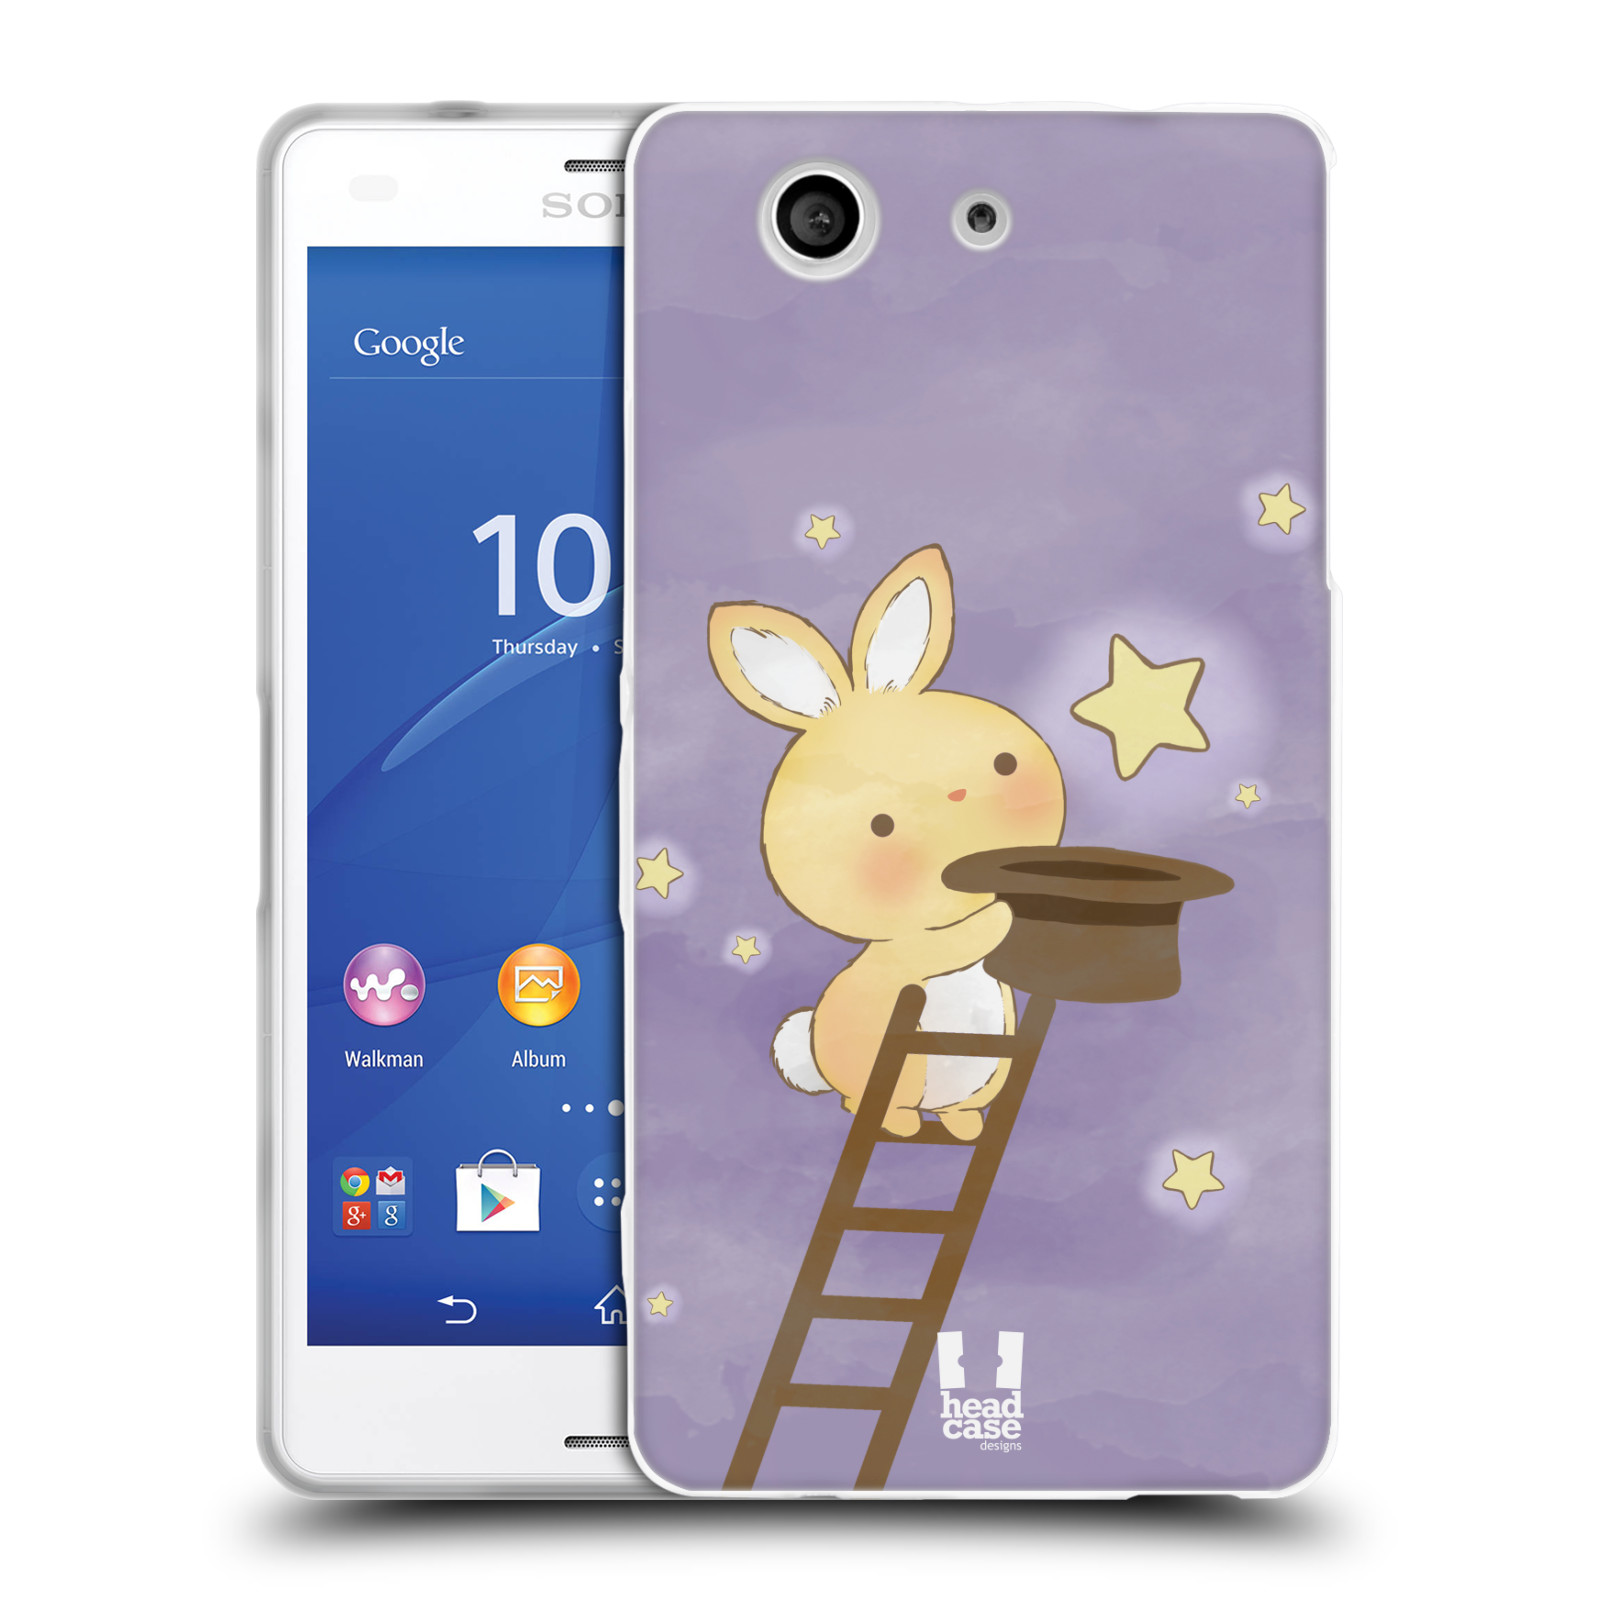 HEAD CASE silikonový obal na mobil Sony Xperia Z3 COMPACT (D5803) vzor králíček a hvězdy fialová